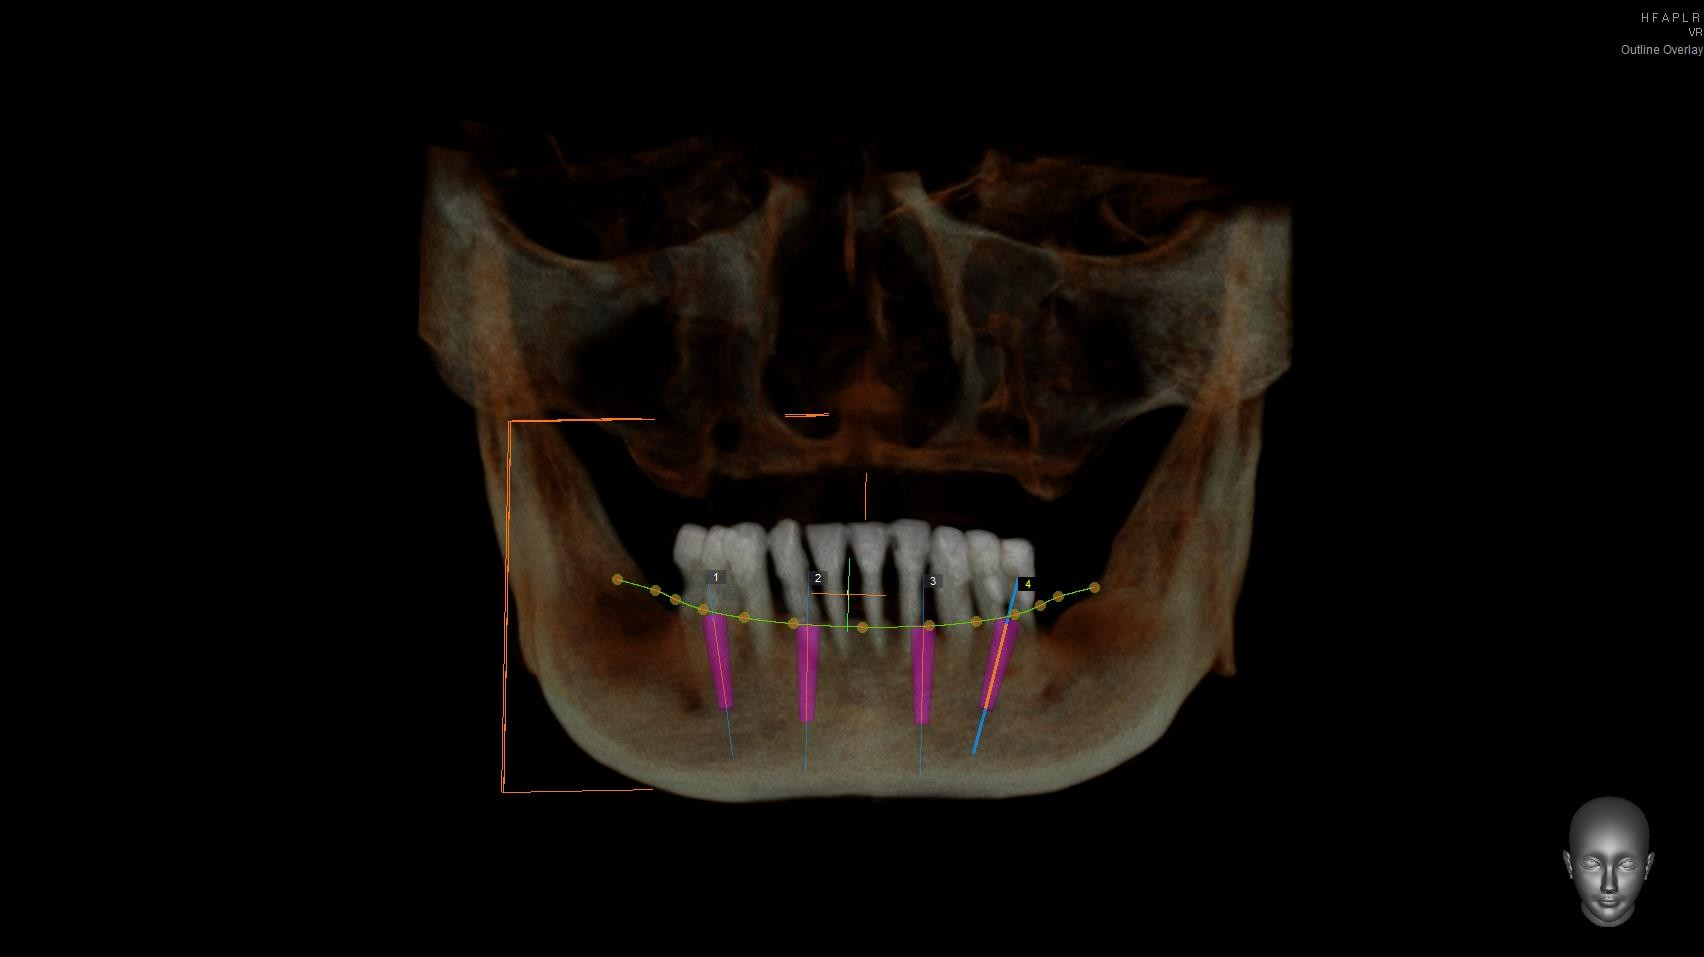 Virtual-Dental-Implant-Planning-Using-Dental-CT-1.jpg